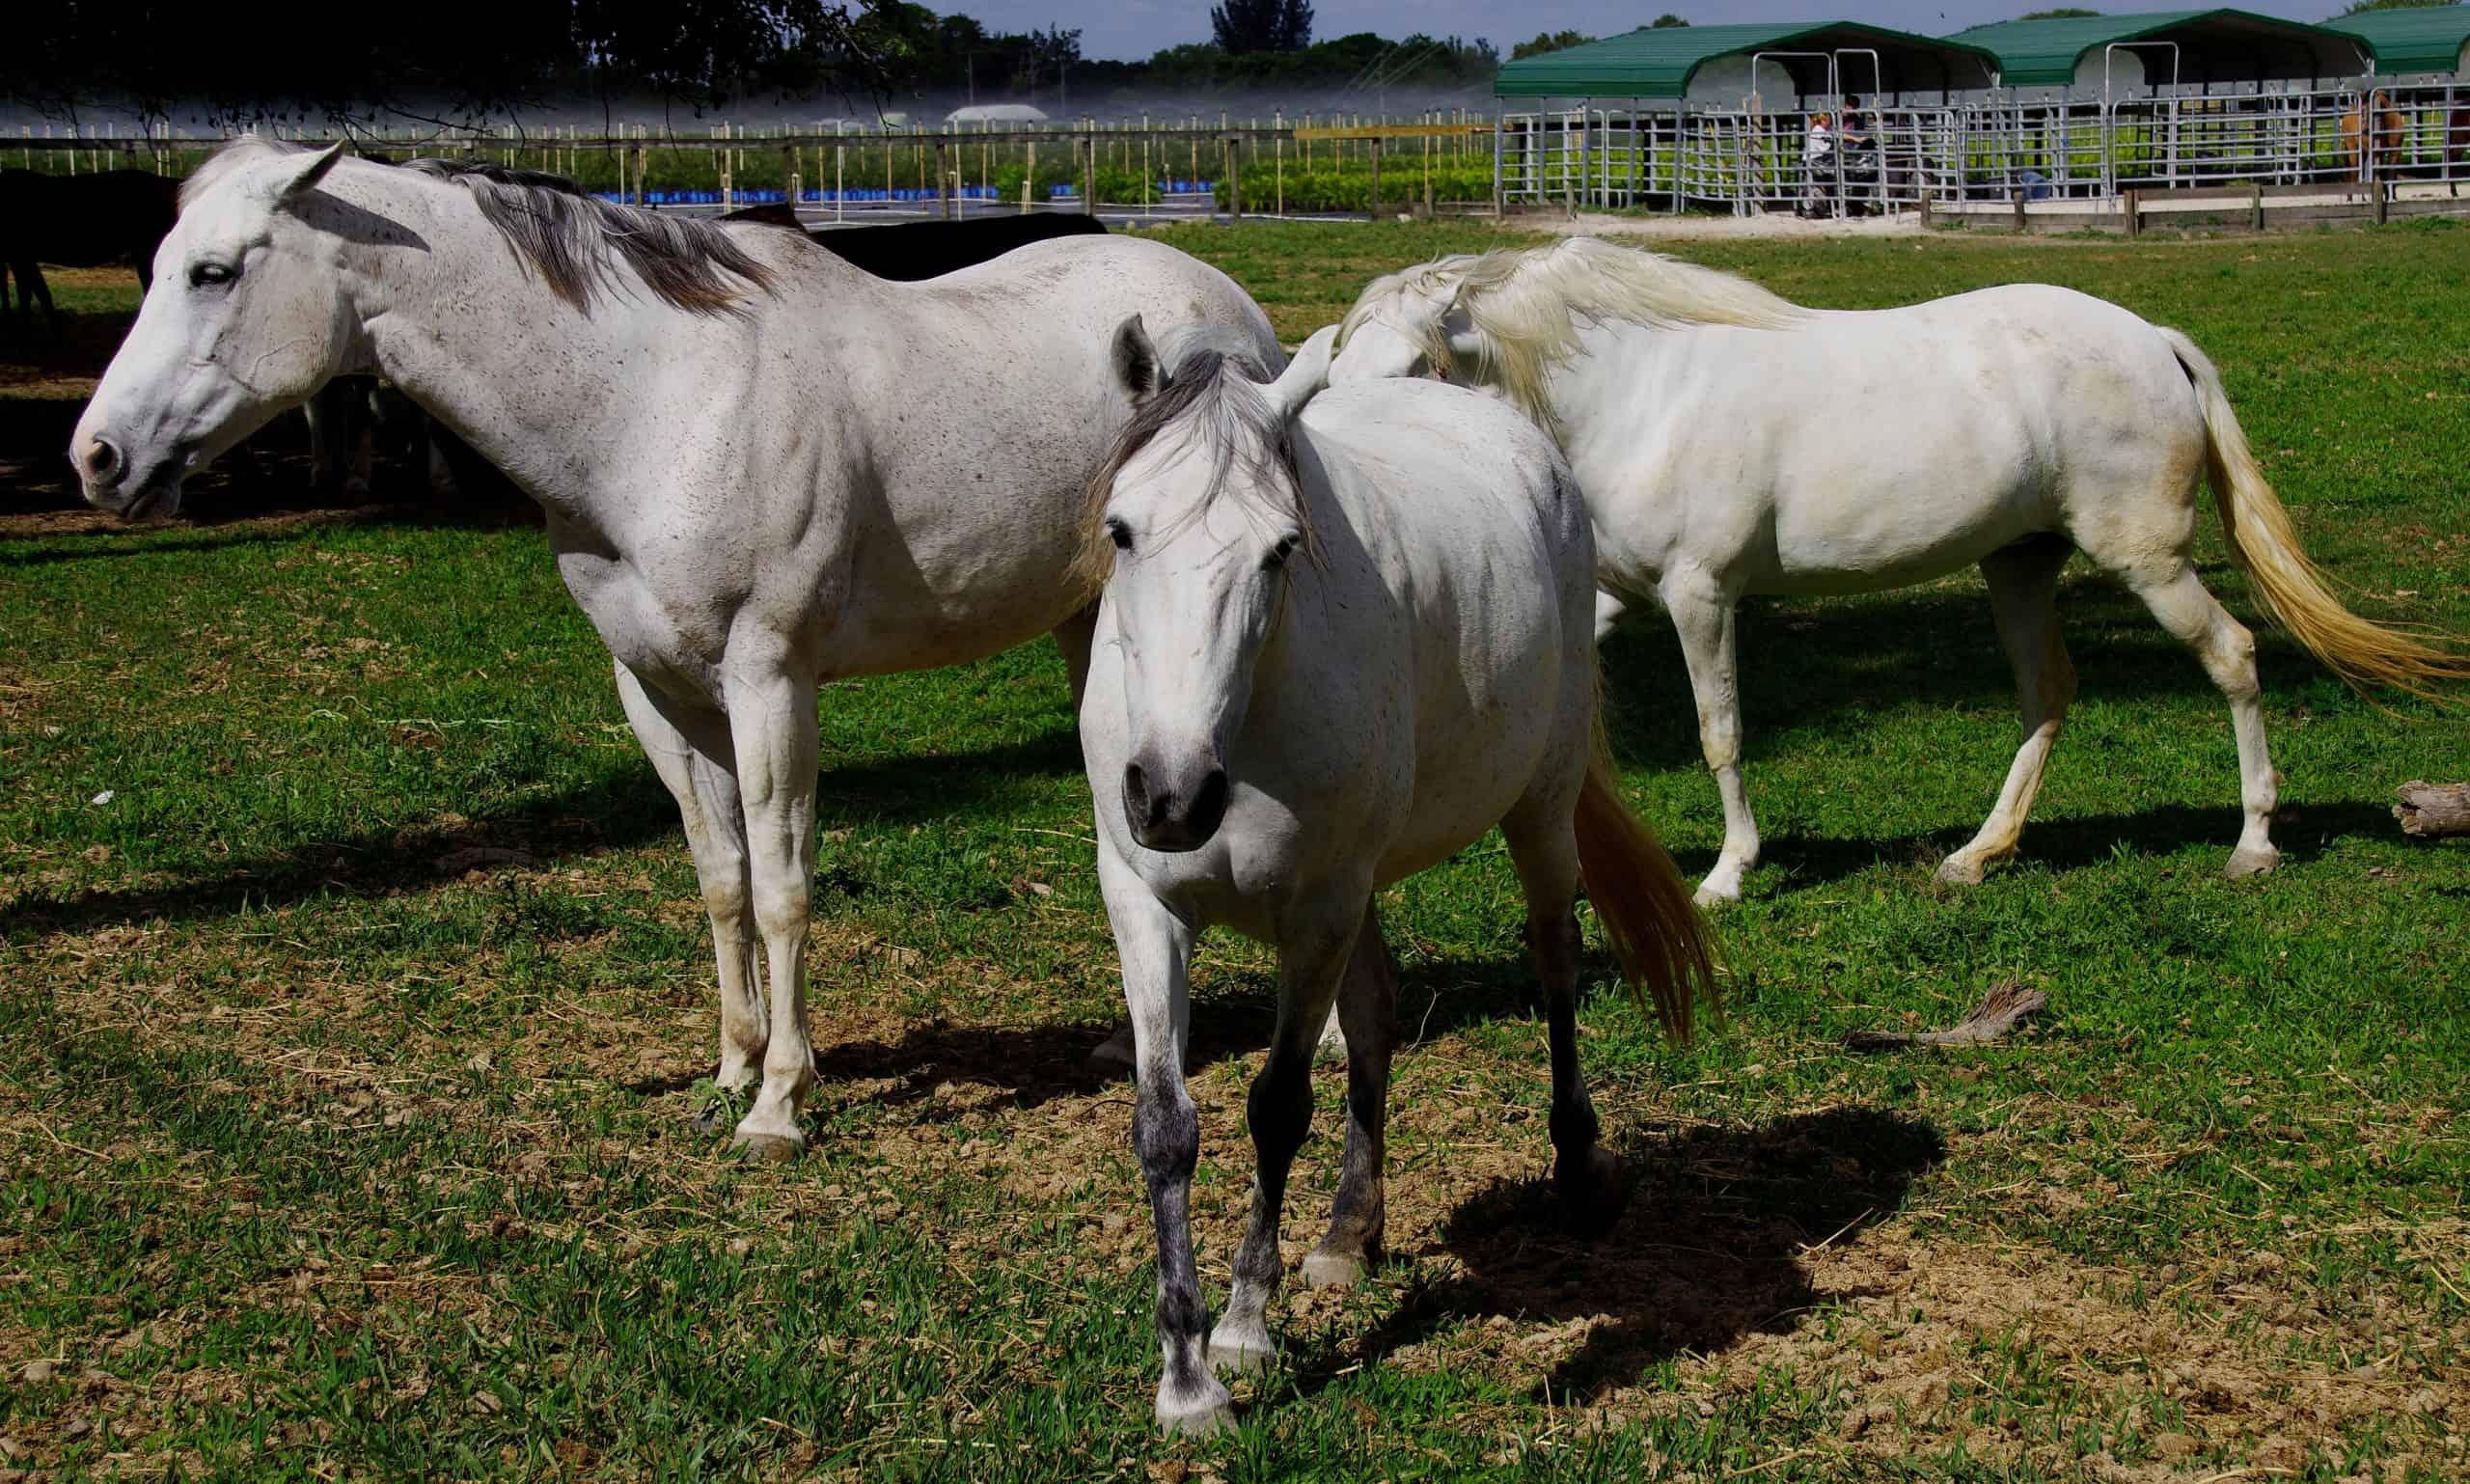 Three white horses at rescue shelter